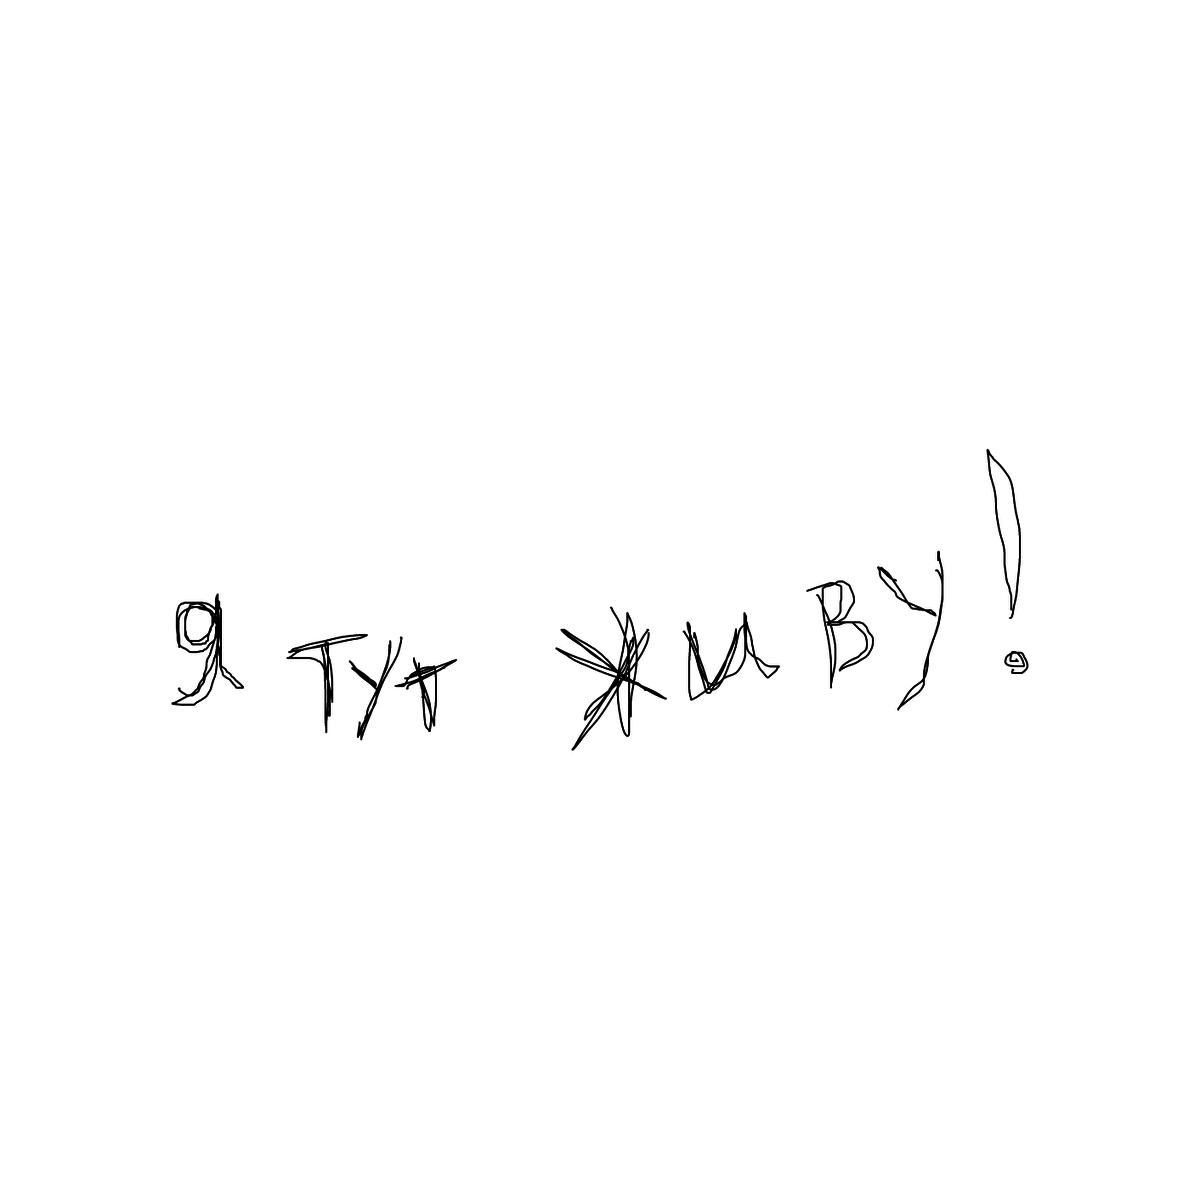 BAAAM drawing#24612 lat:52.2823600769043000lng: 104.2887573242187500